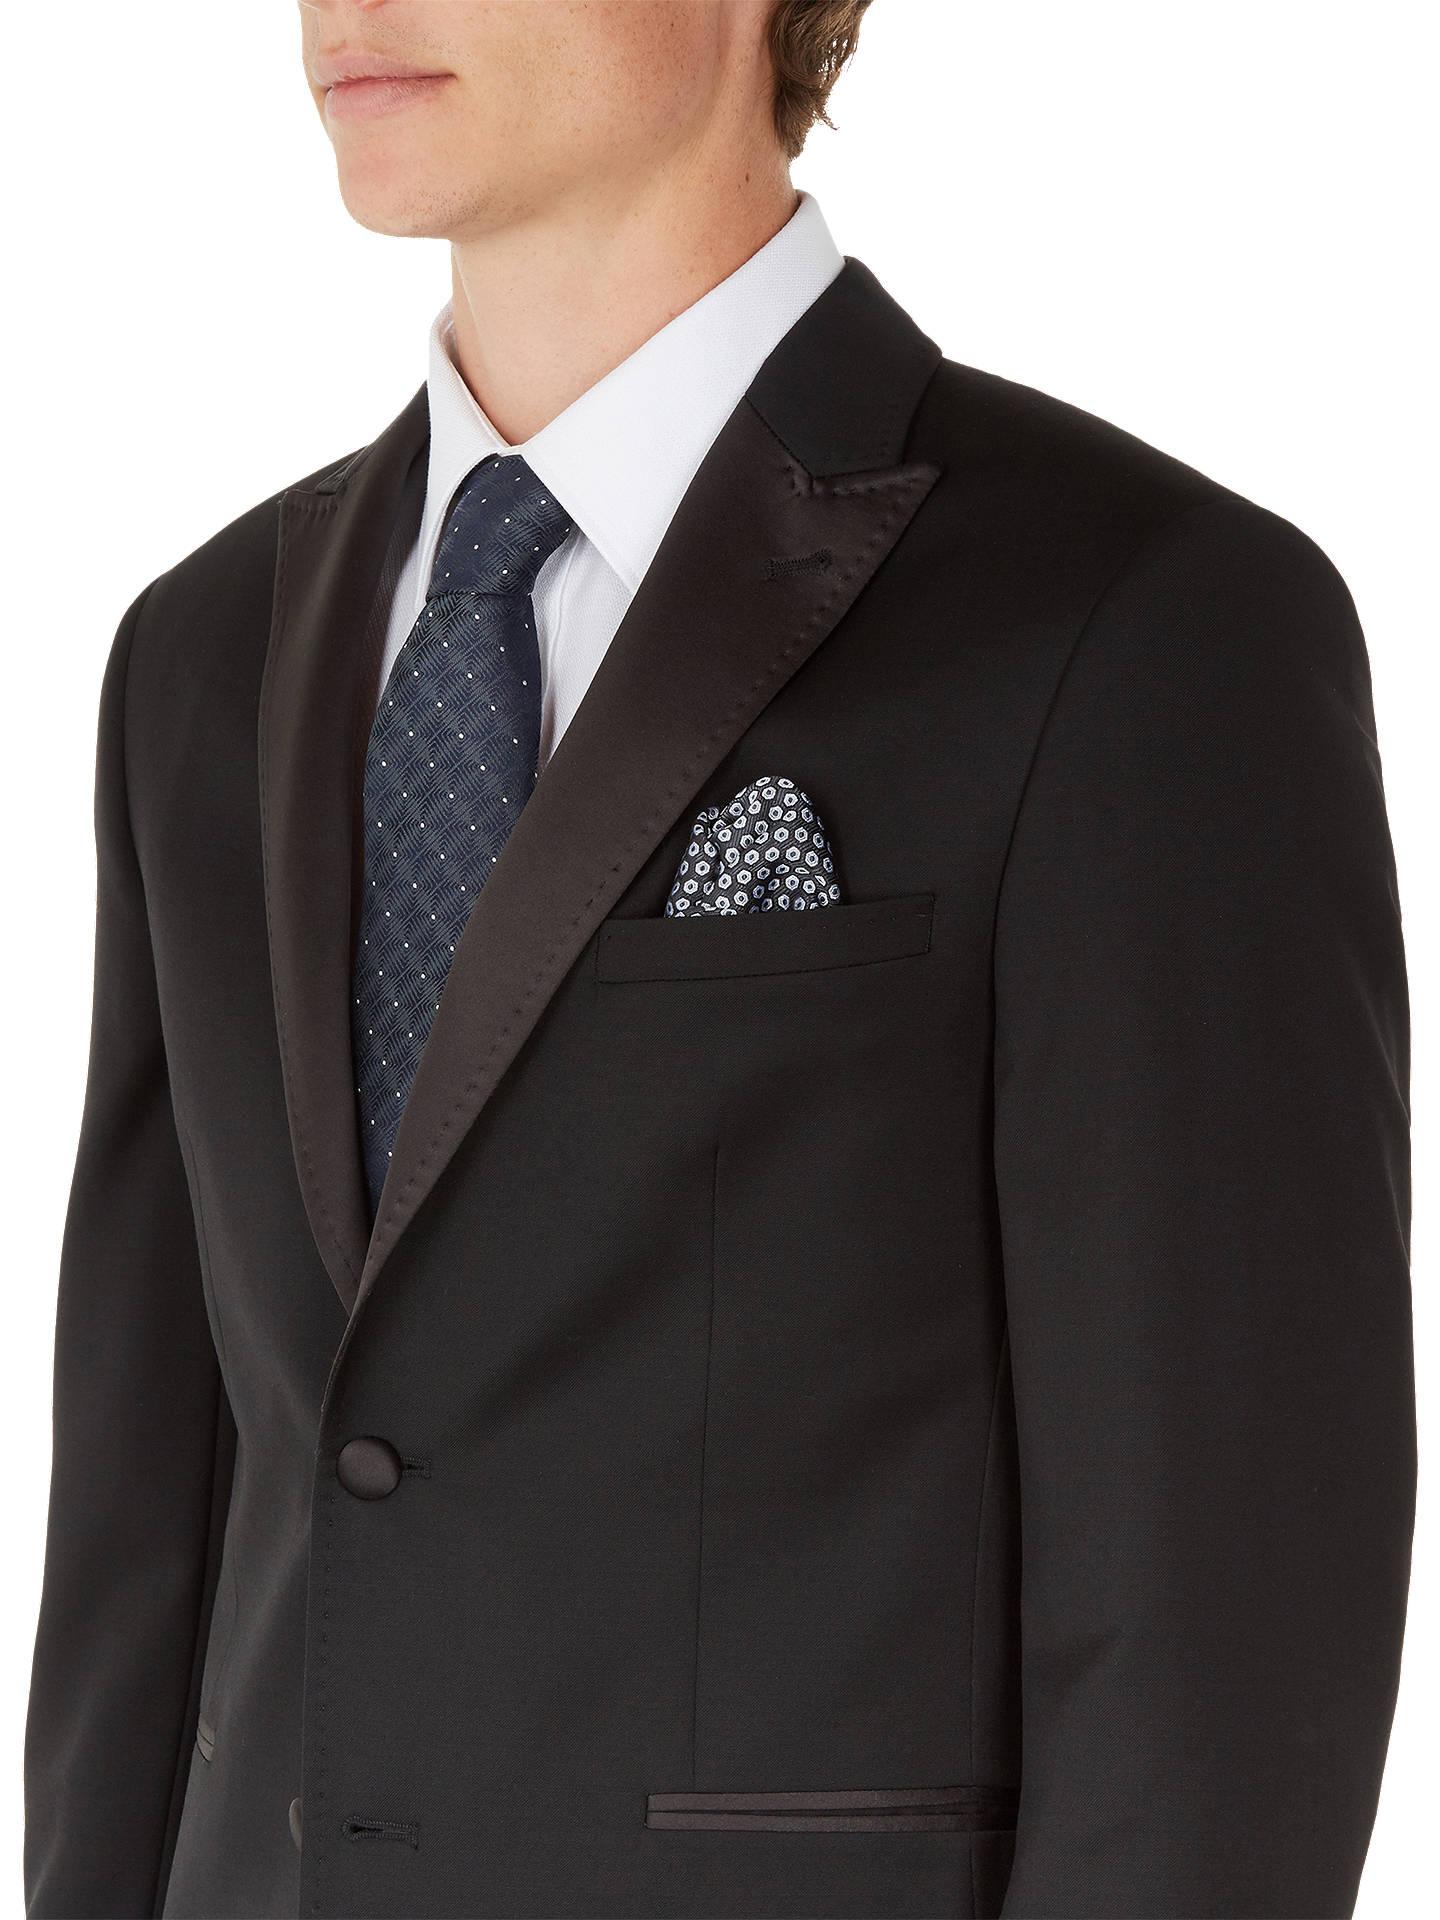 25123d87790 Buy Ted Baker Satjonj Satin Lapel Dress Suit Jacket, Black, 38S Online at  johnlewis ...